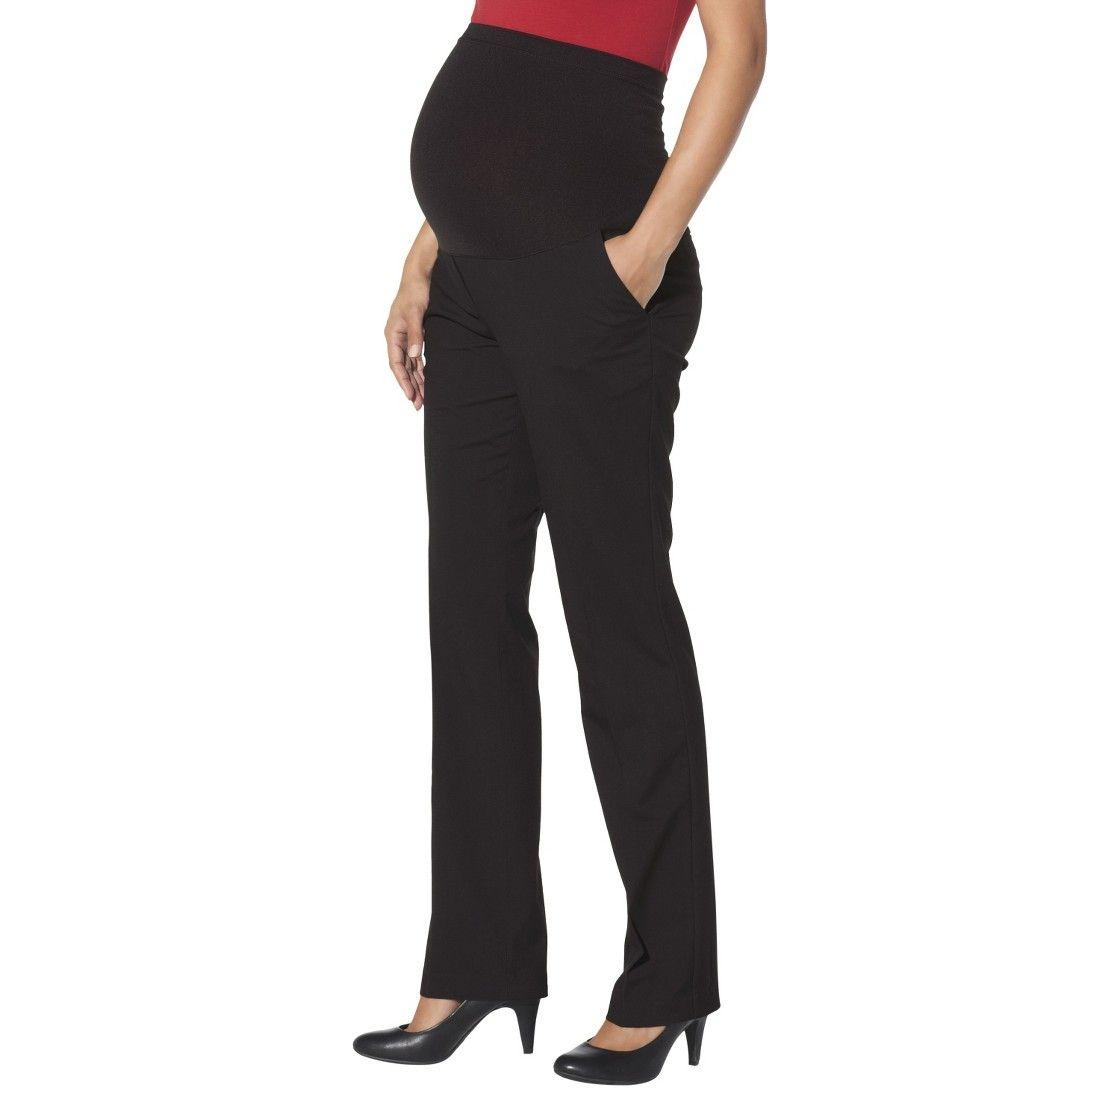 Maternity Straight Leg Pants Black Liz Lange For Target Maternity Pants Black Maternity Pants Target Maternity [ 1120 x 1120 Pixel ]